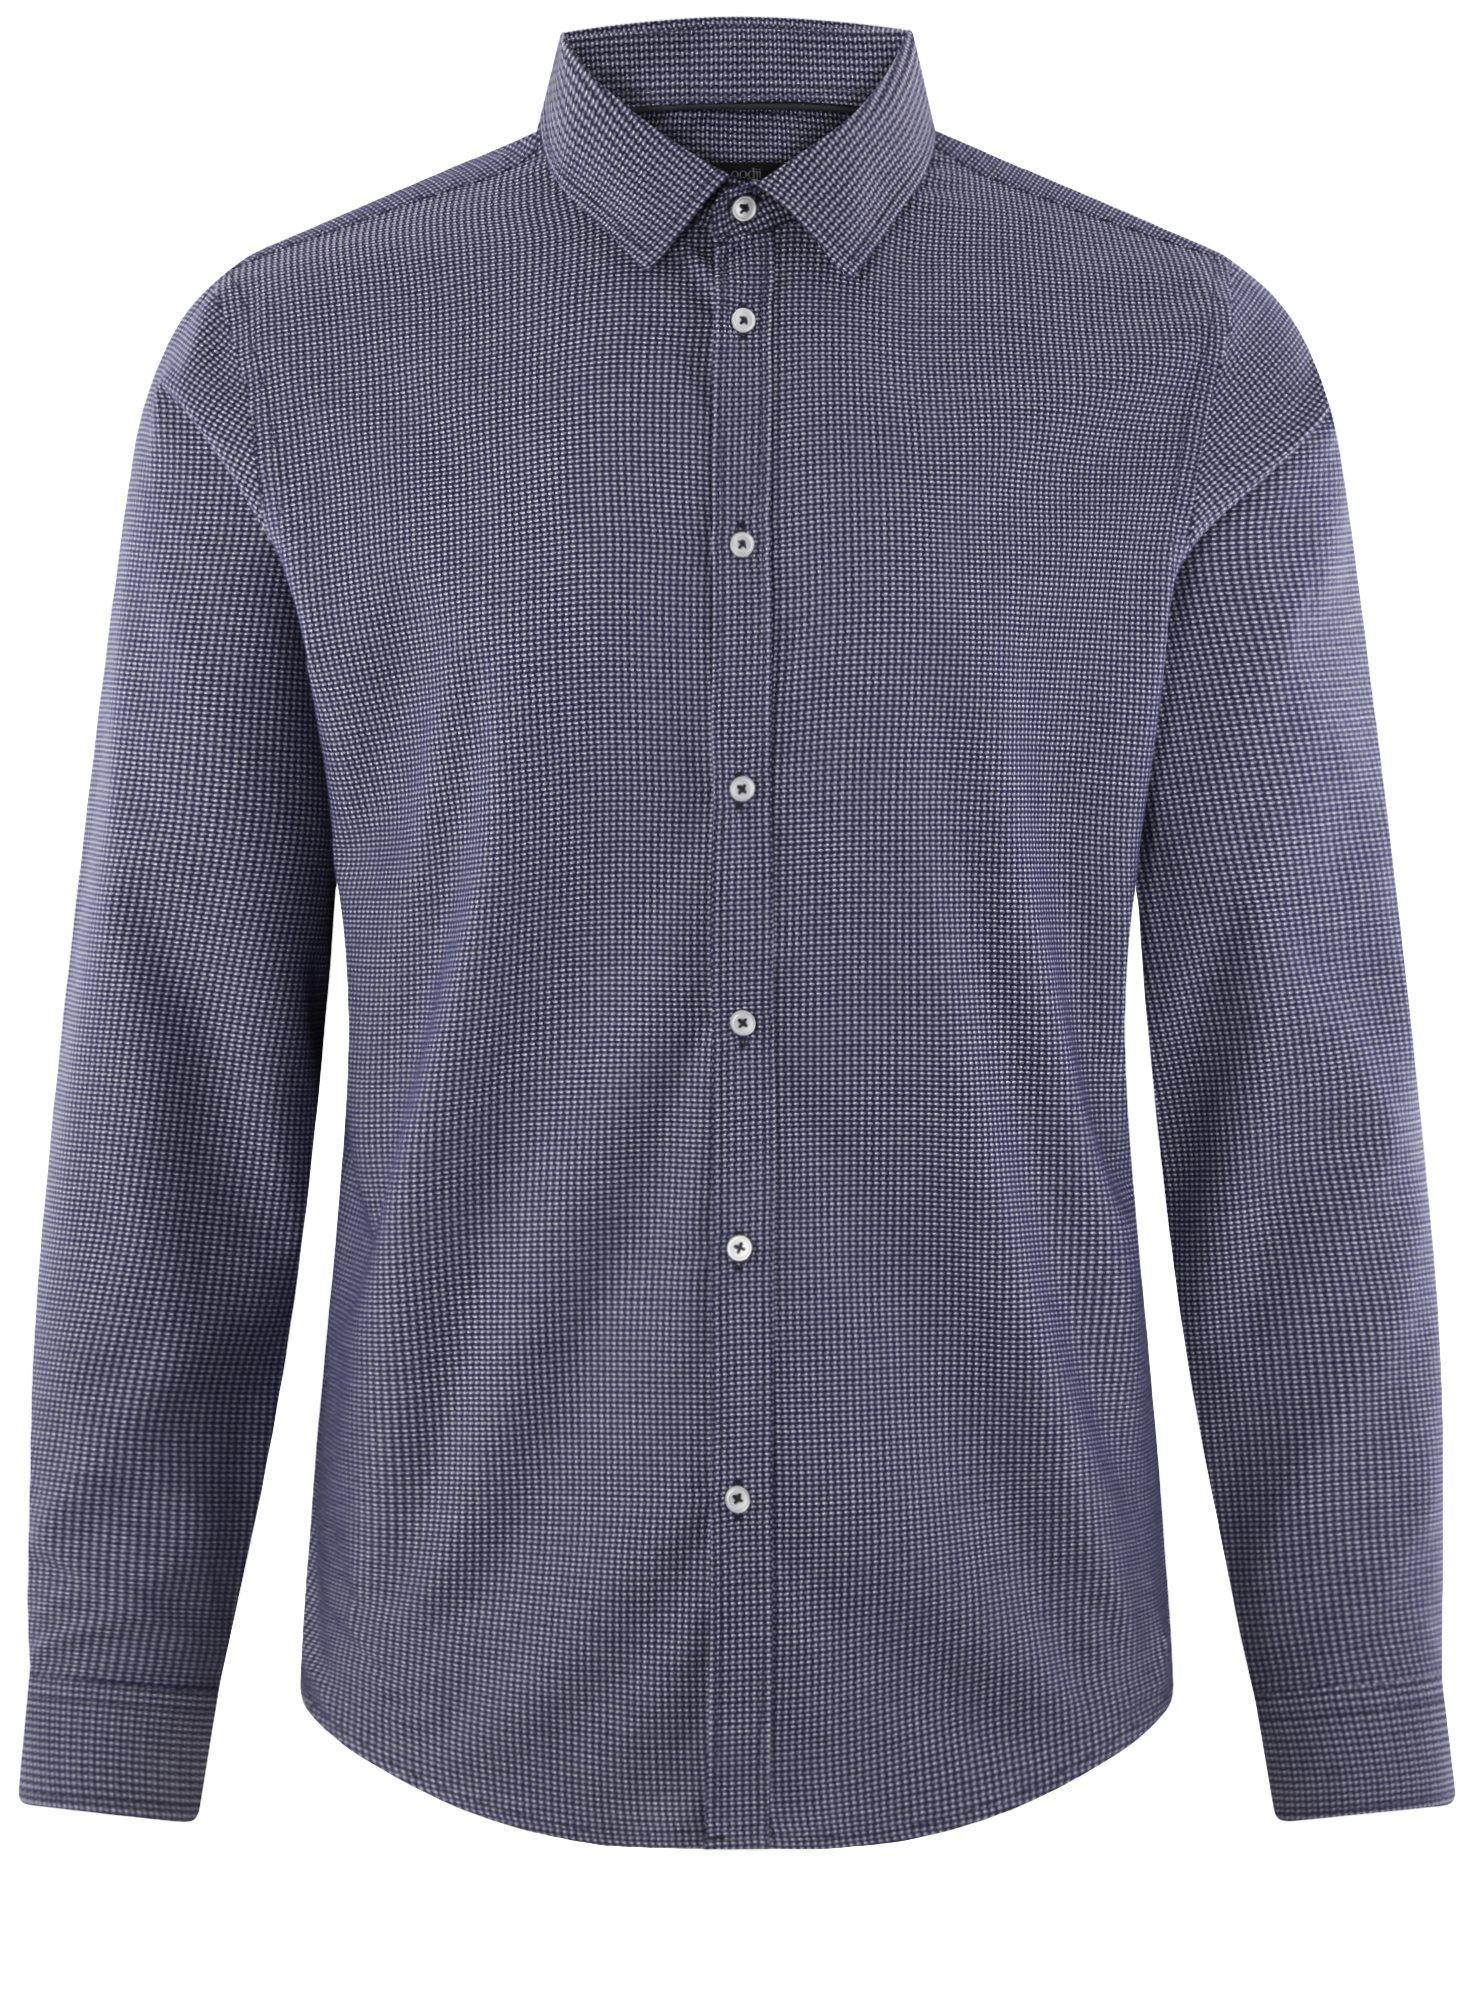 Рубашка приталенная из хлопка oodji для мужчины (синий), 3L110354M/49029N/7910O